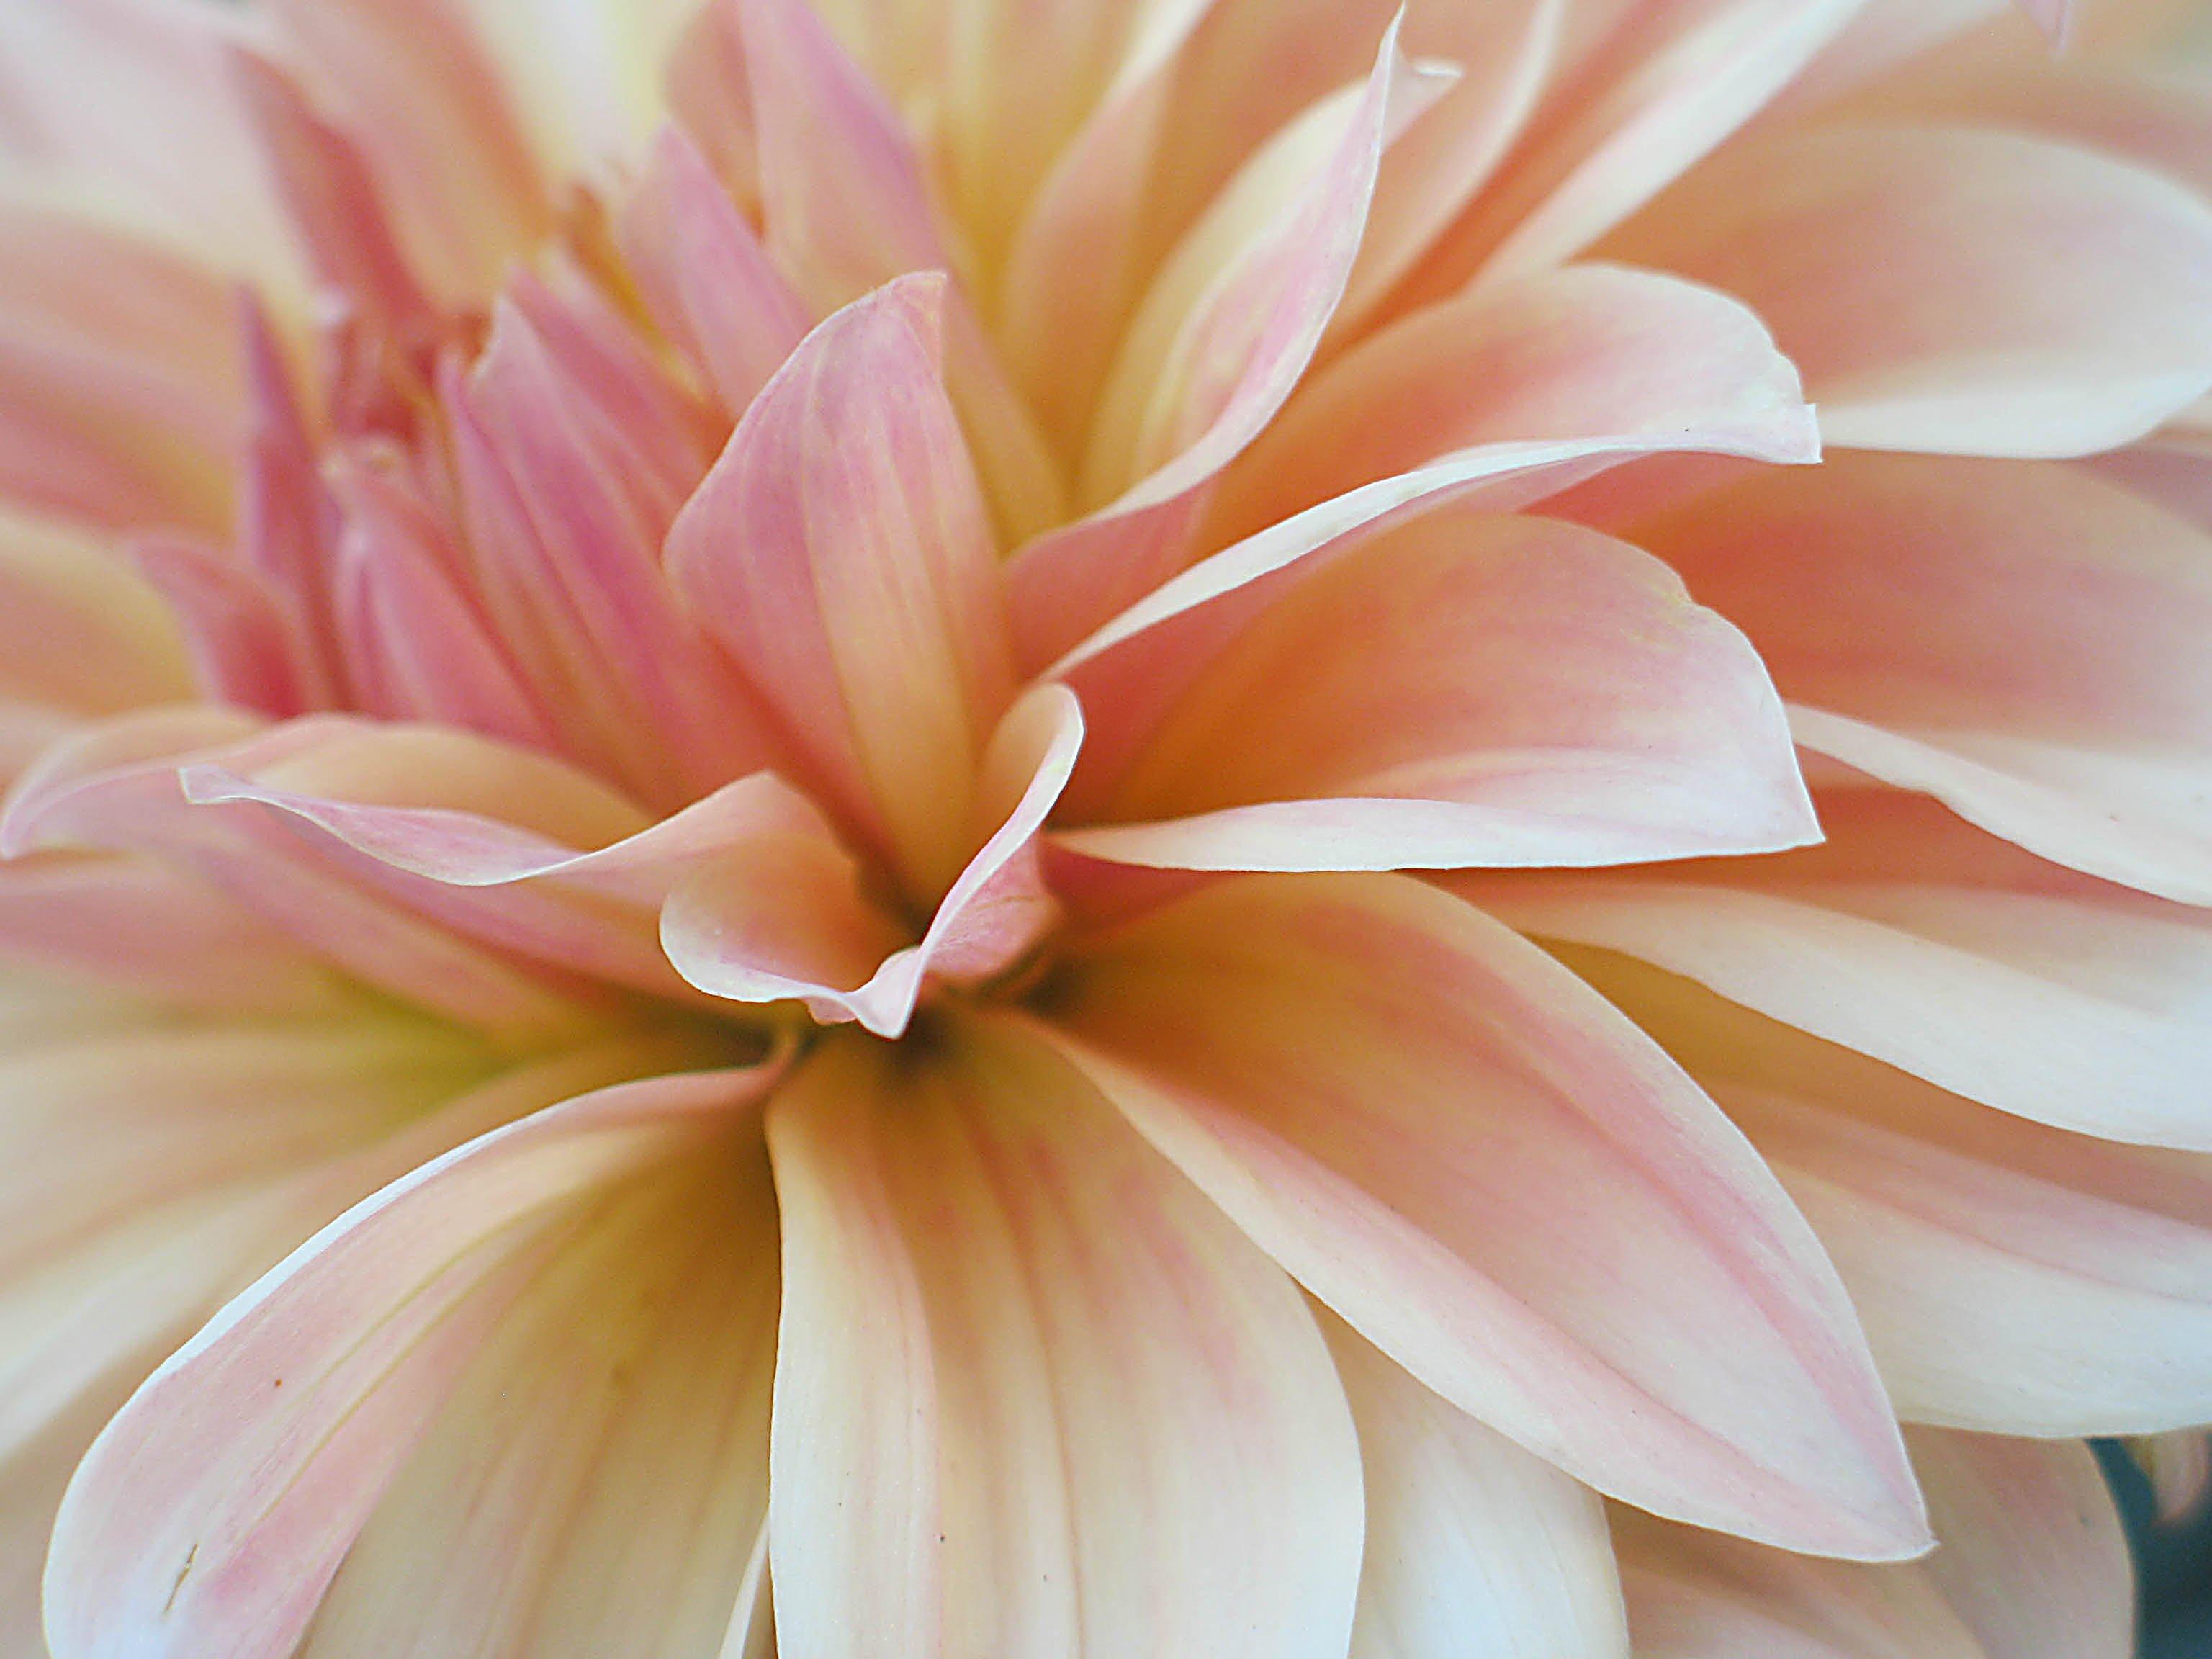 Flowers for the summer season